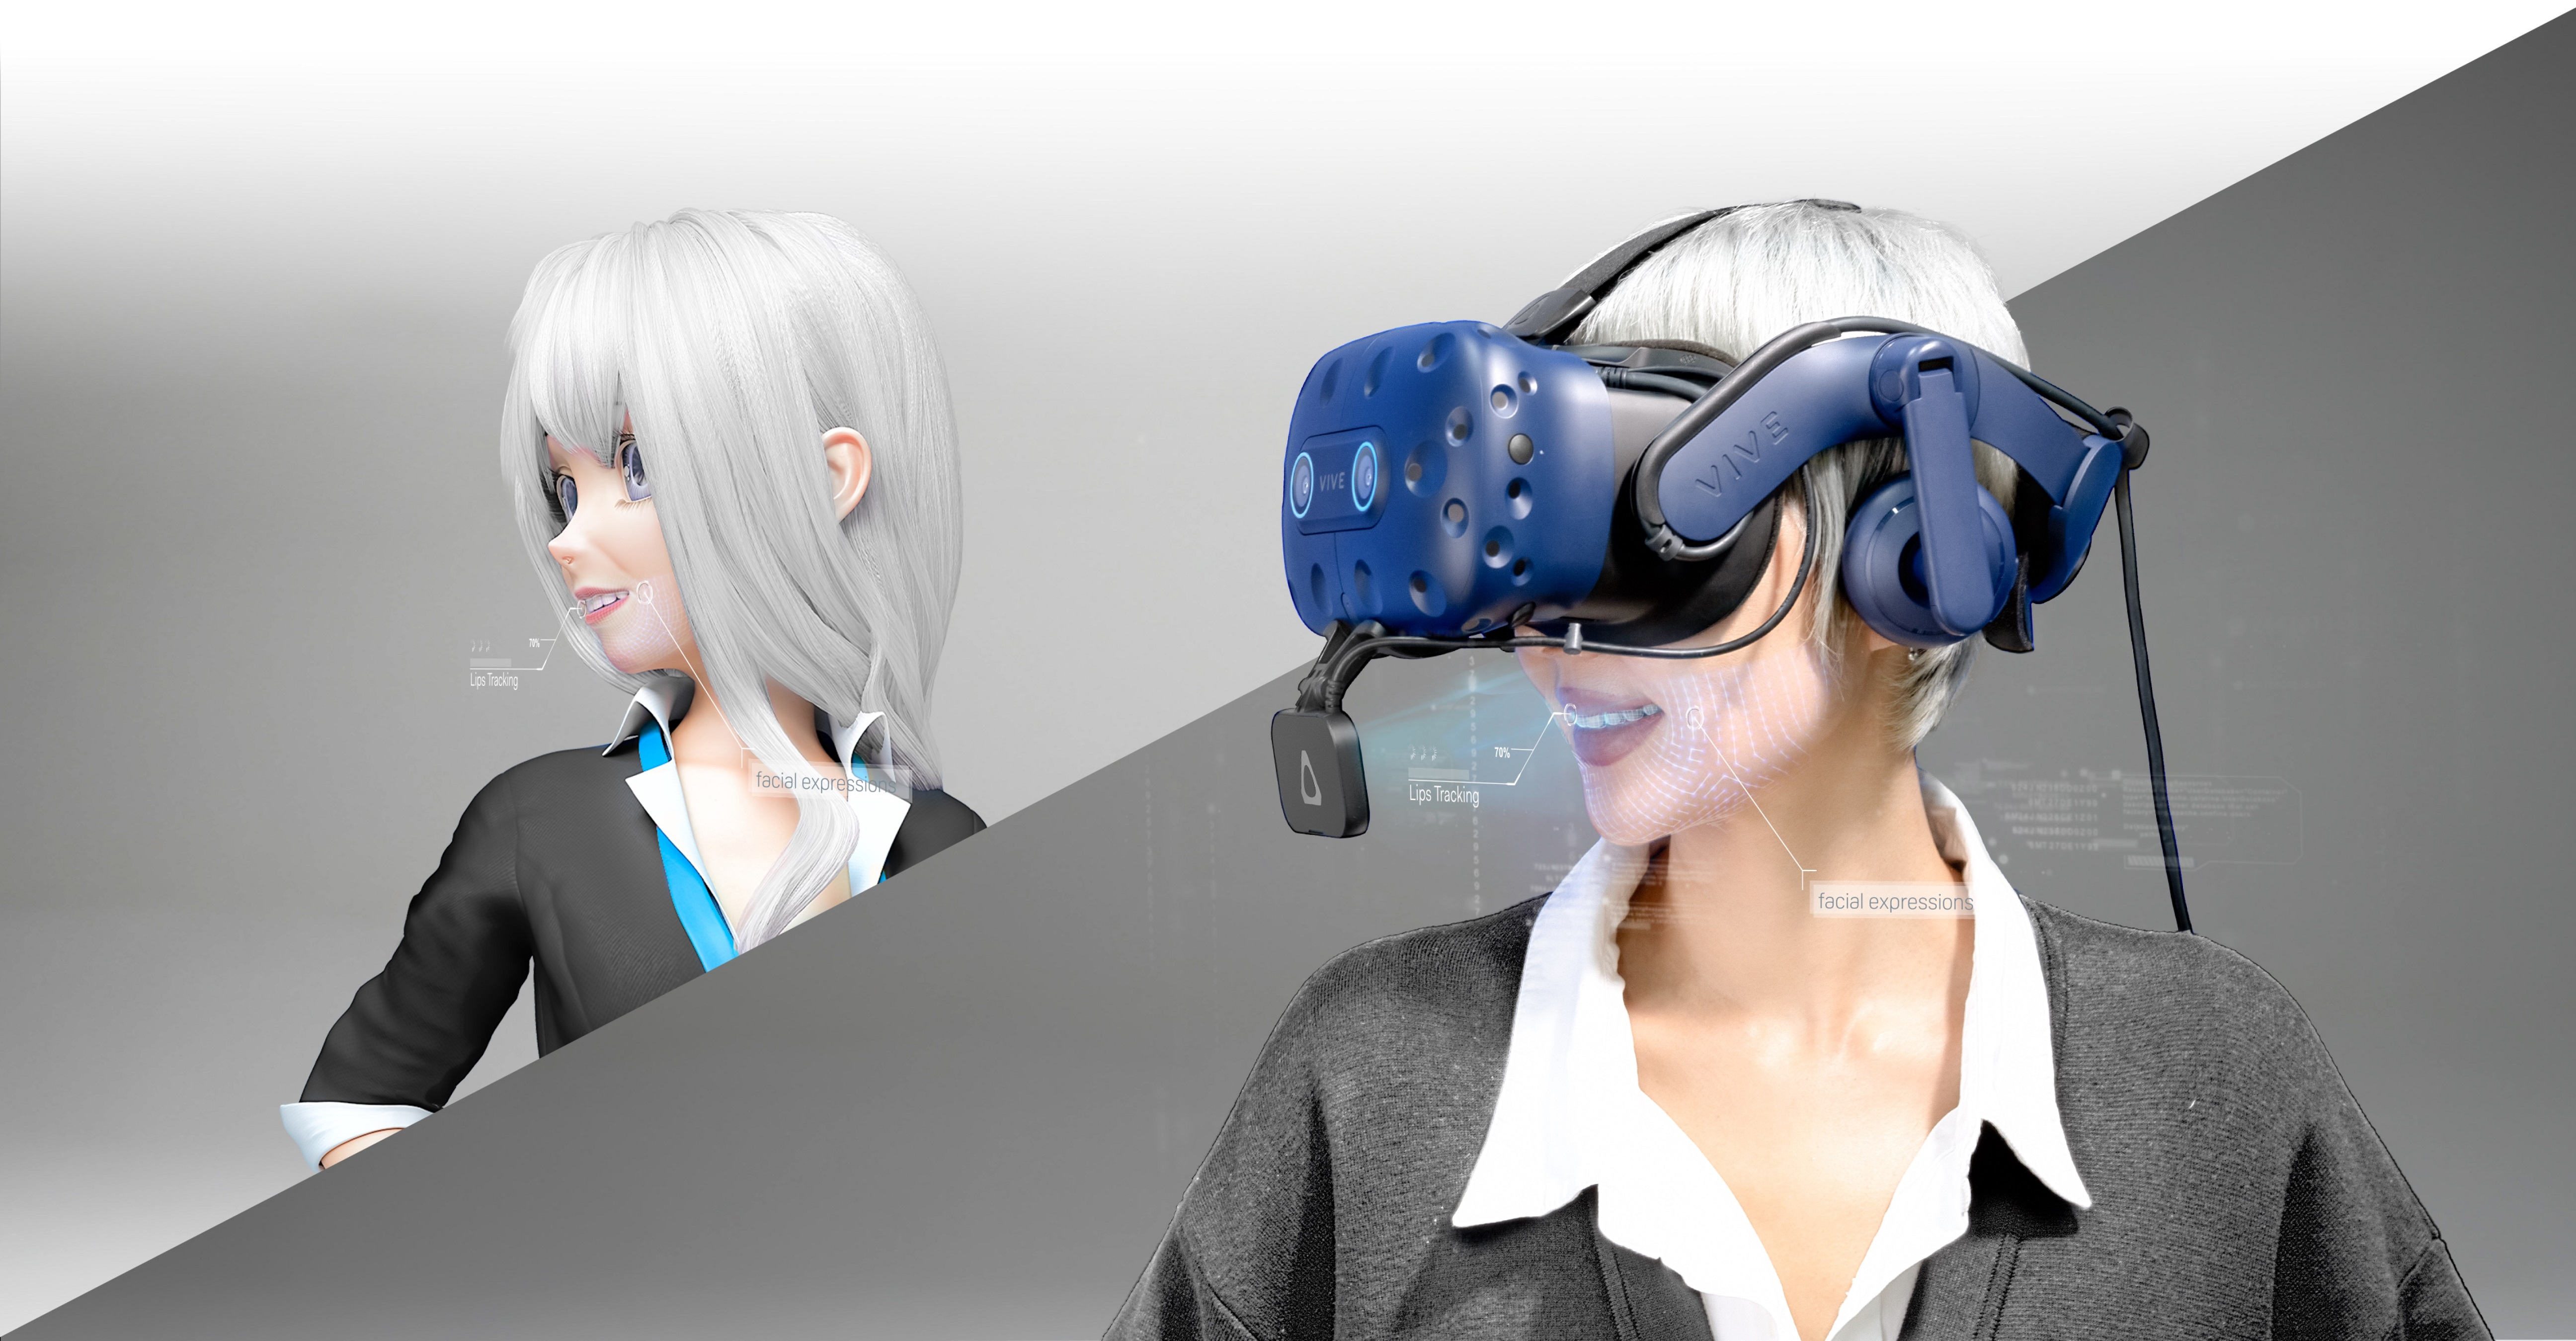 HTC bringt Vive Facial Tracker